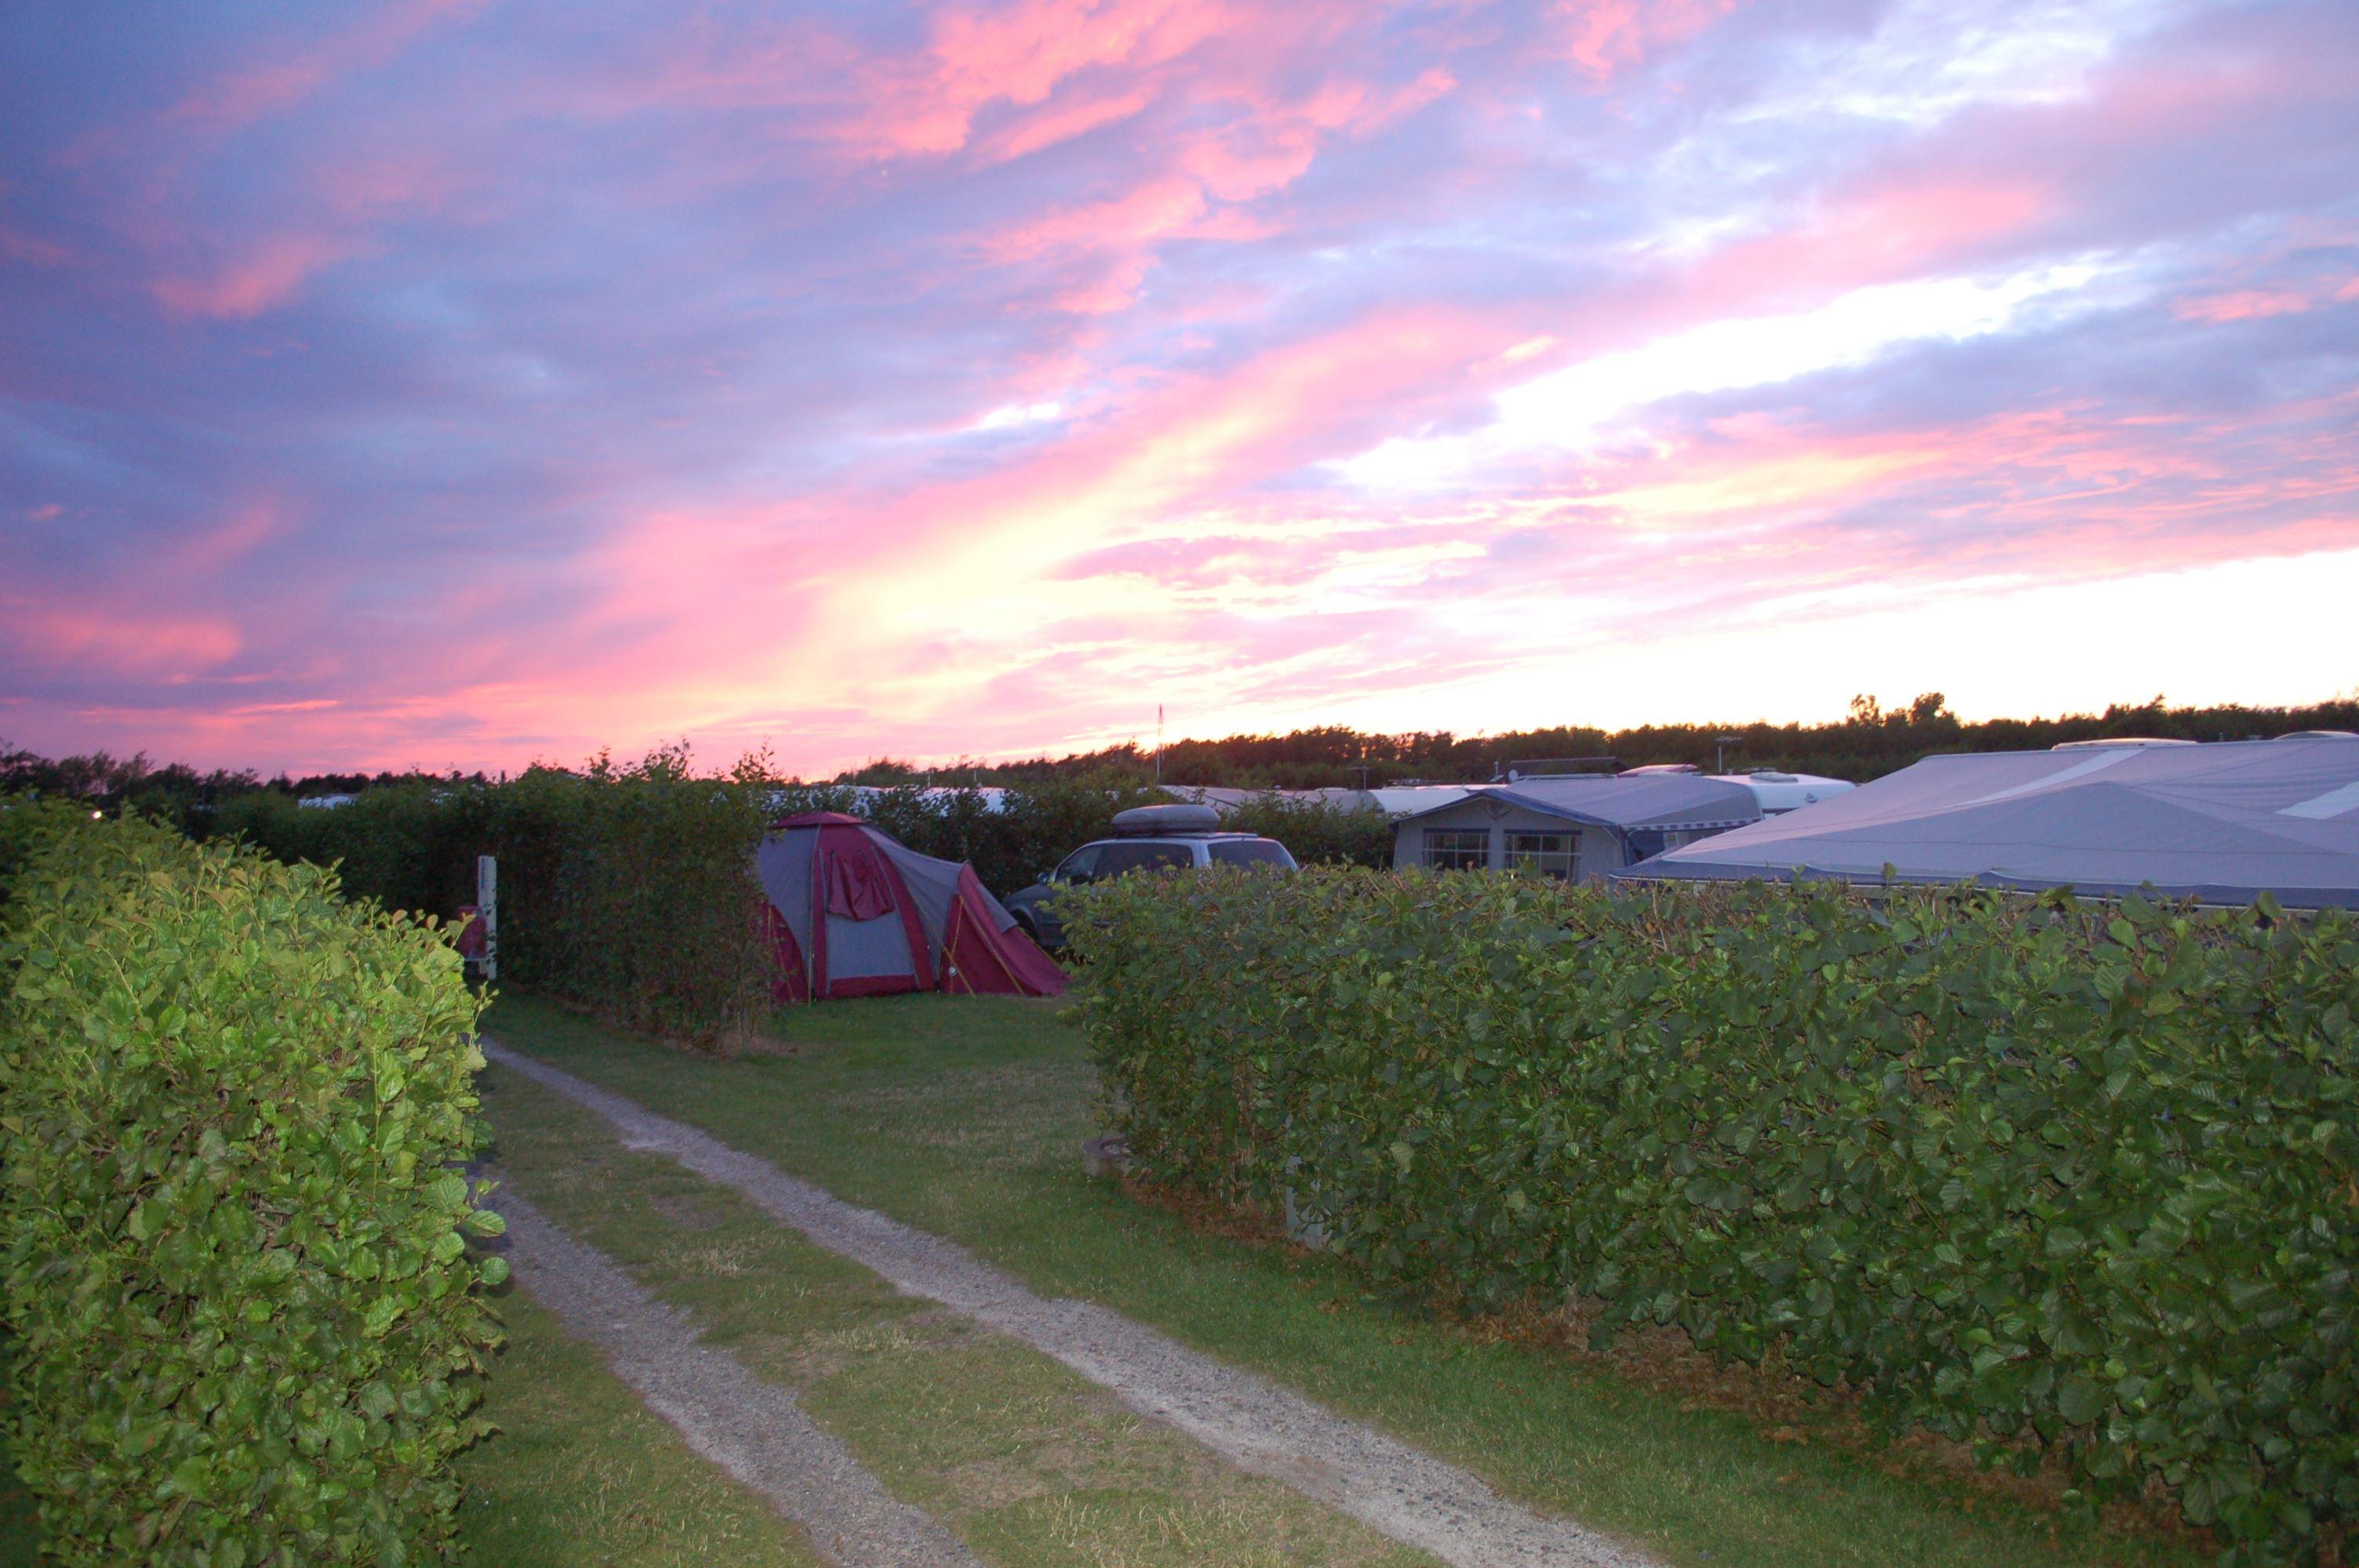 Rødgaard Camping - Camp site